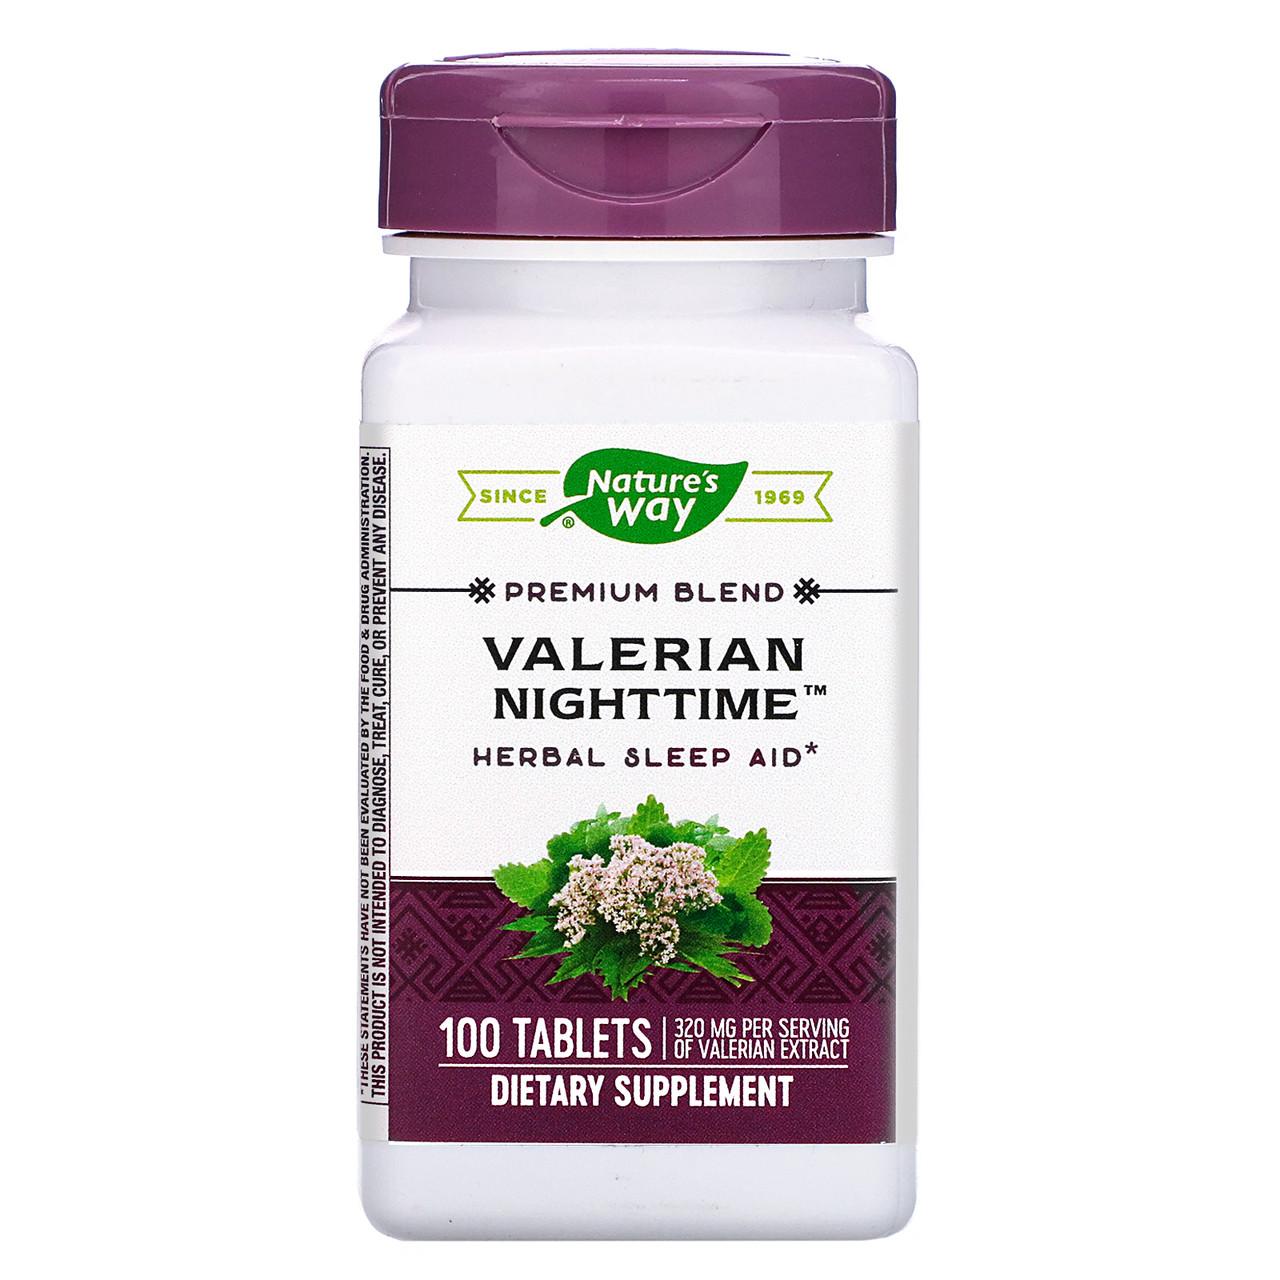 "Валериана от бессонницы Nature's Way ""Valerian Nighttime"" 320 мг (100 таблеток)"